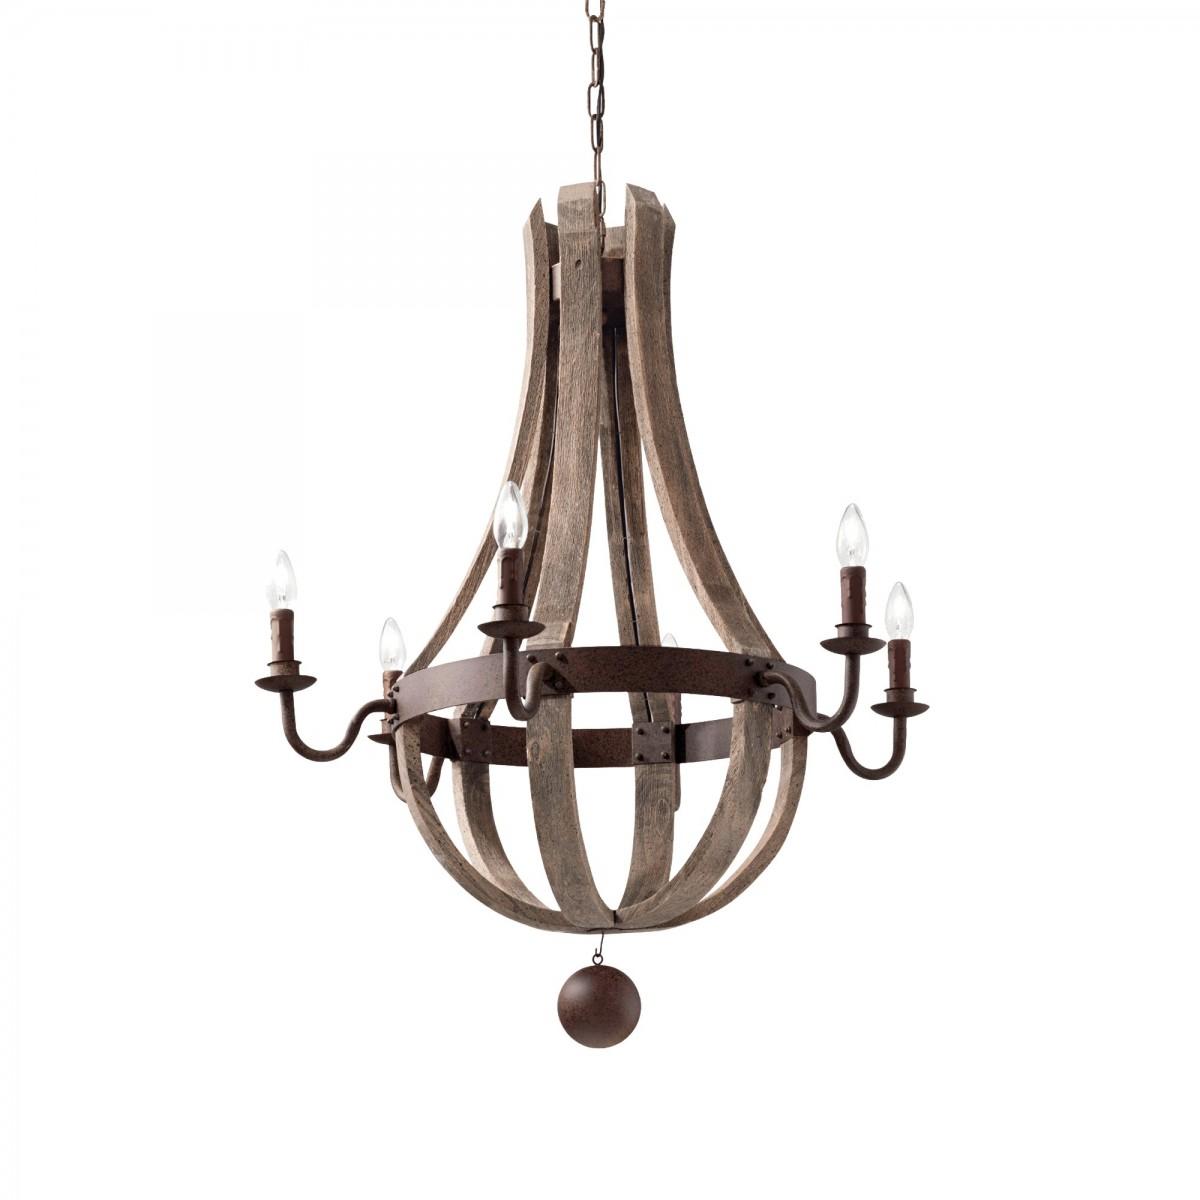 závěsný lustr Ideal Lux Millennium SP6 129693 6x40W E14 - monumentální osvětlení